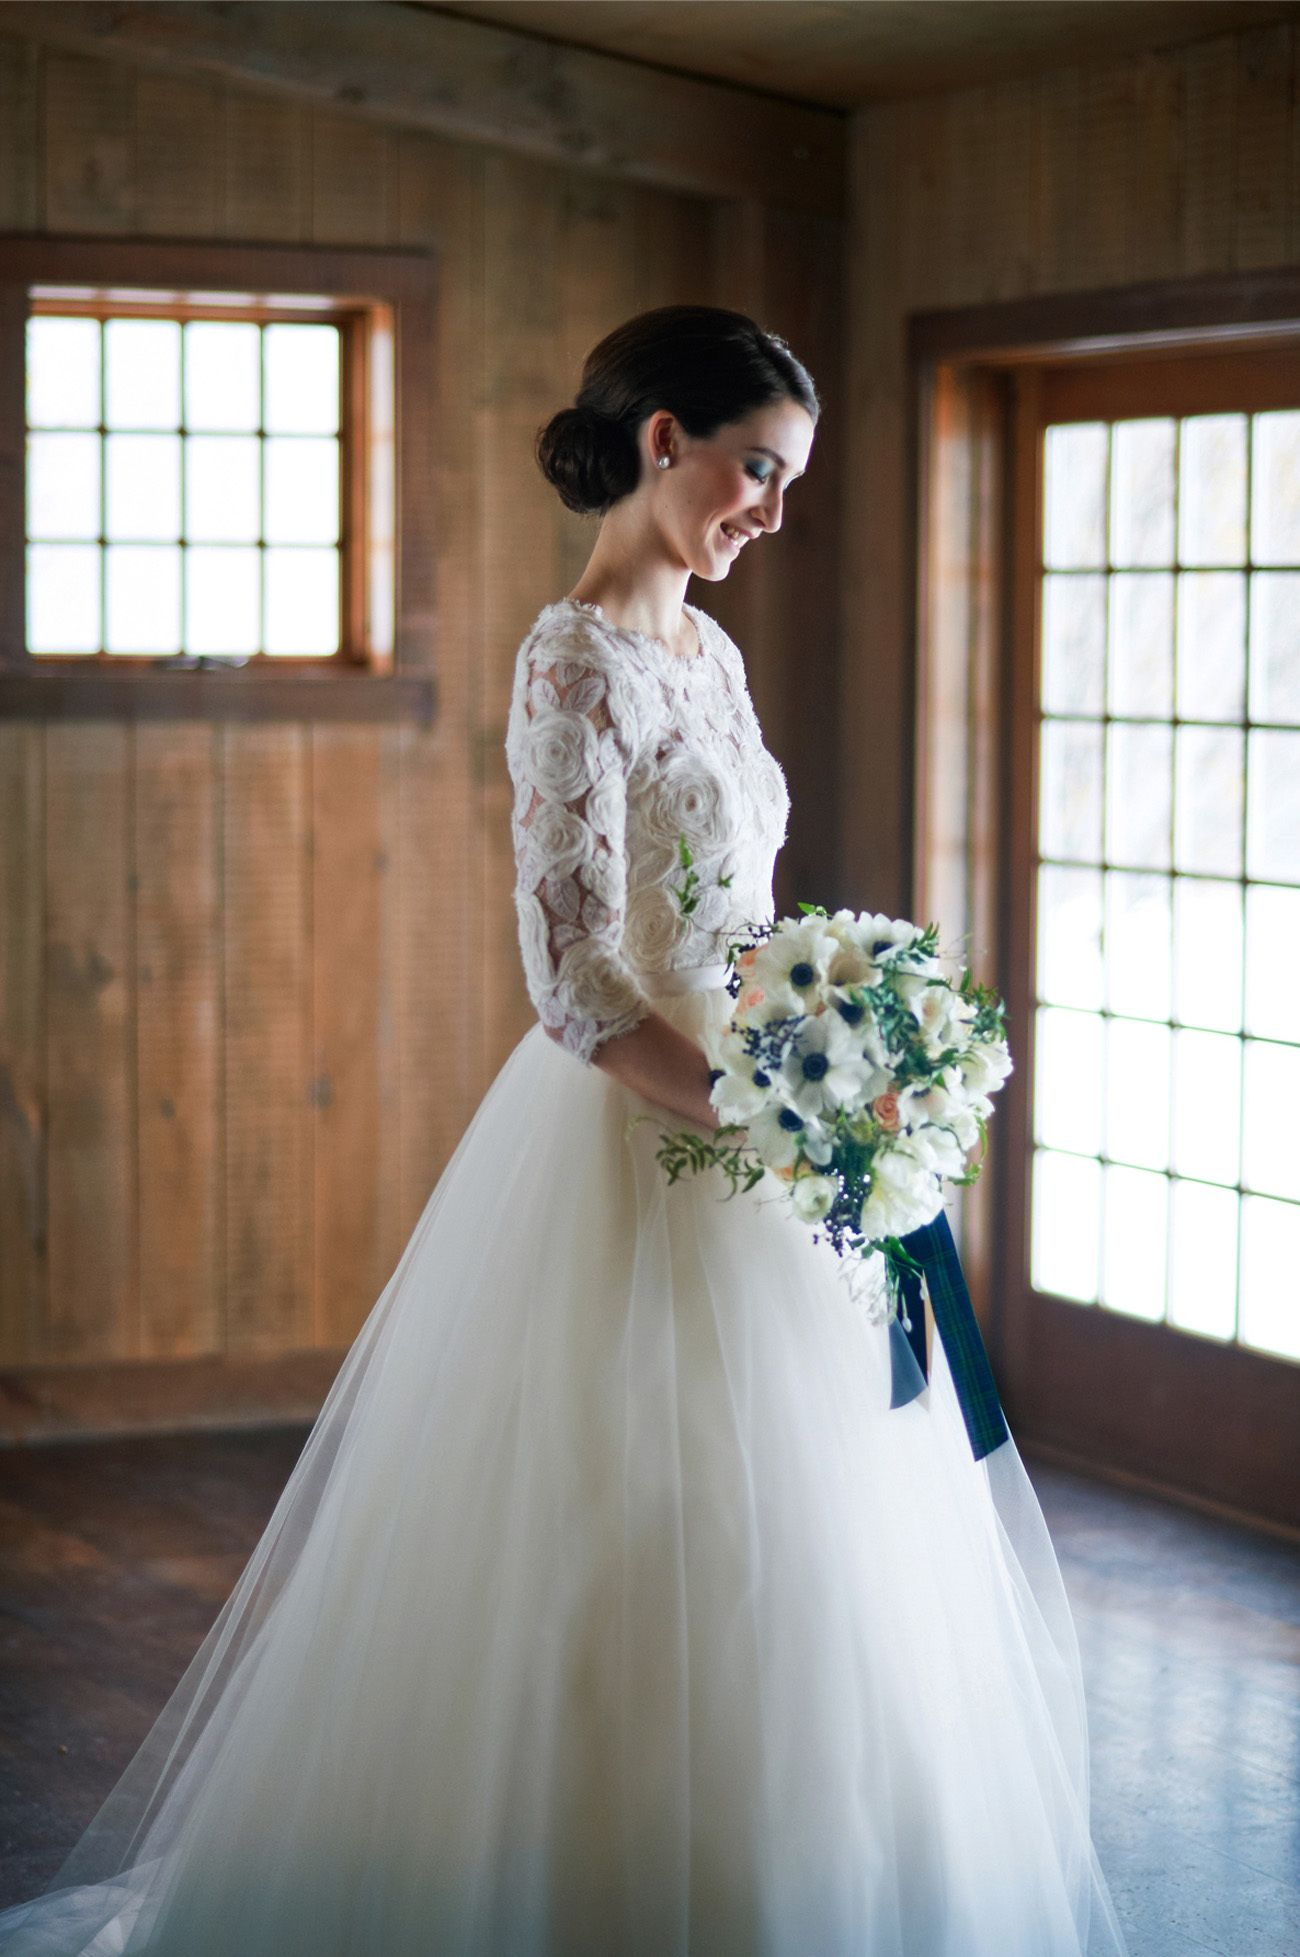 Wedding dresses downtown la  Tartan and Tulle Inspiration Shoot  Modern trousseau Wedding dress